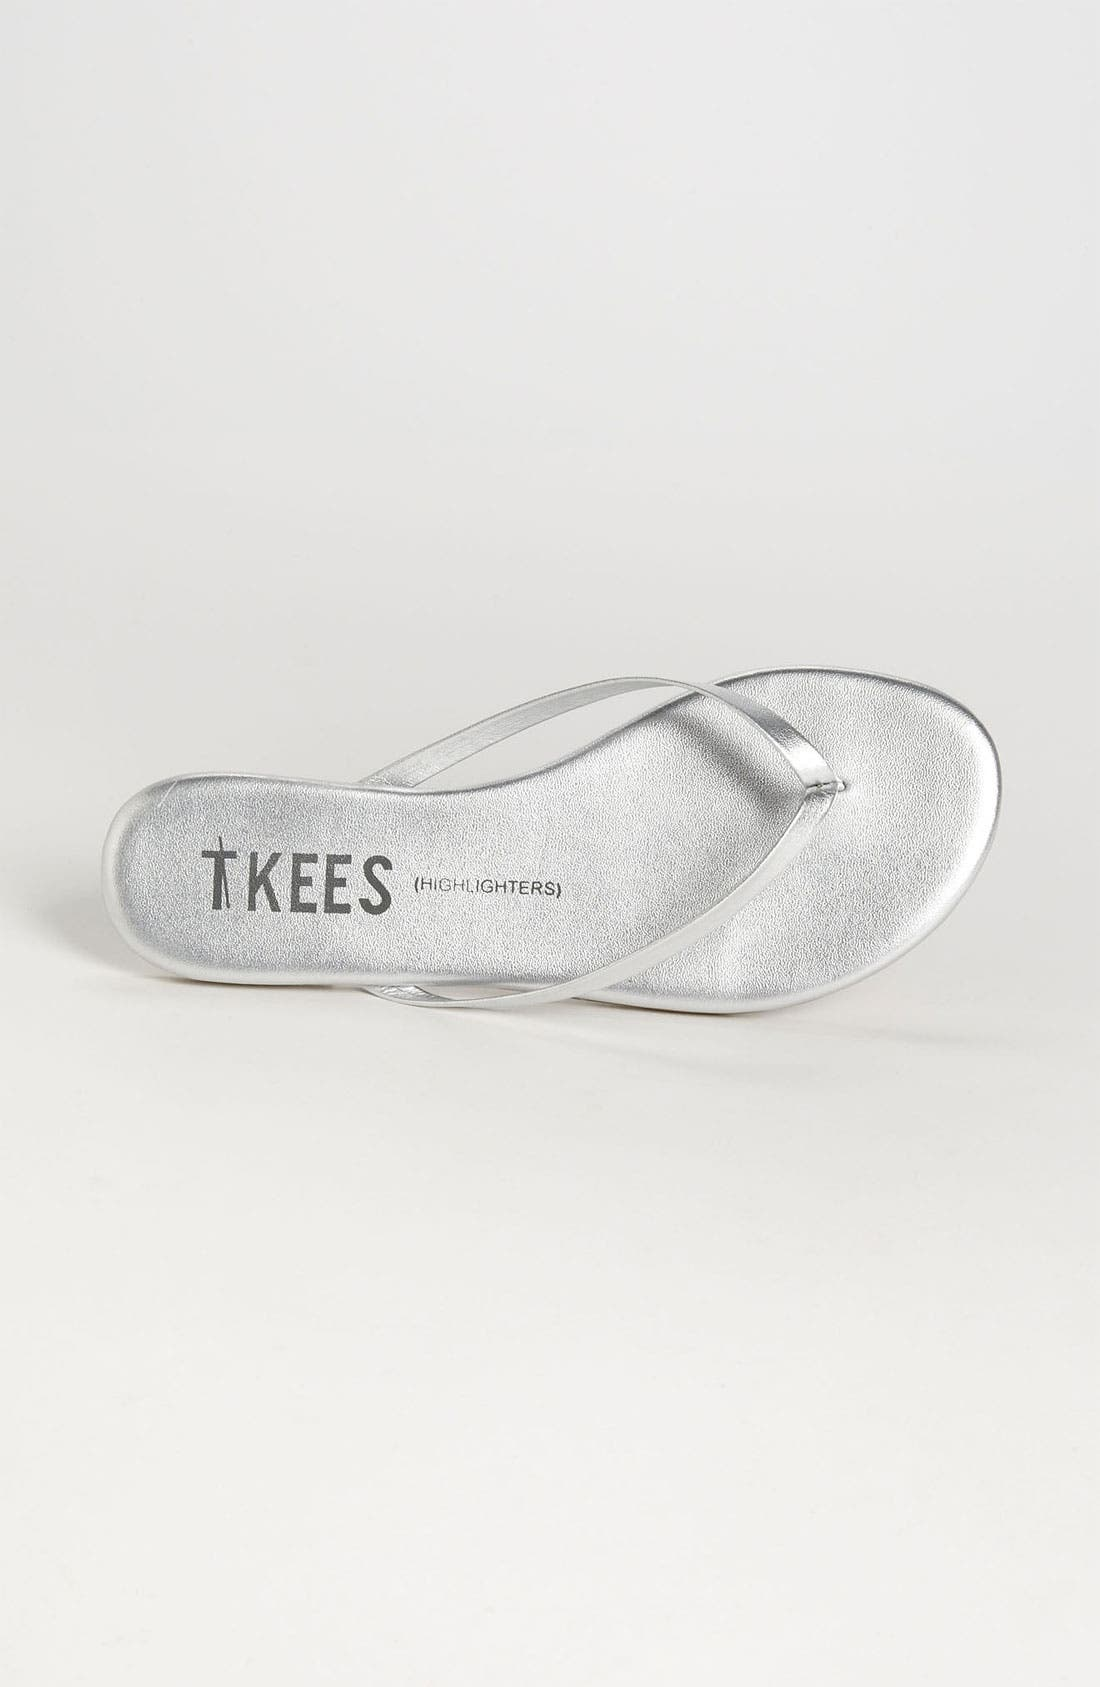 Alternate Image 3  - TKEES 'Highlighters' Flip Flop